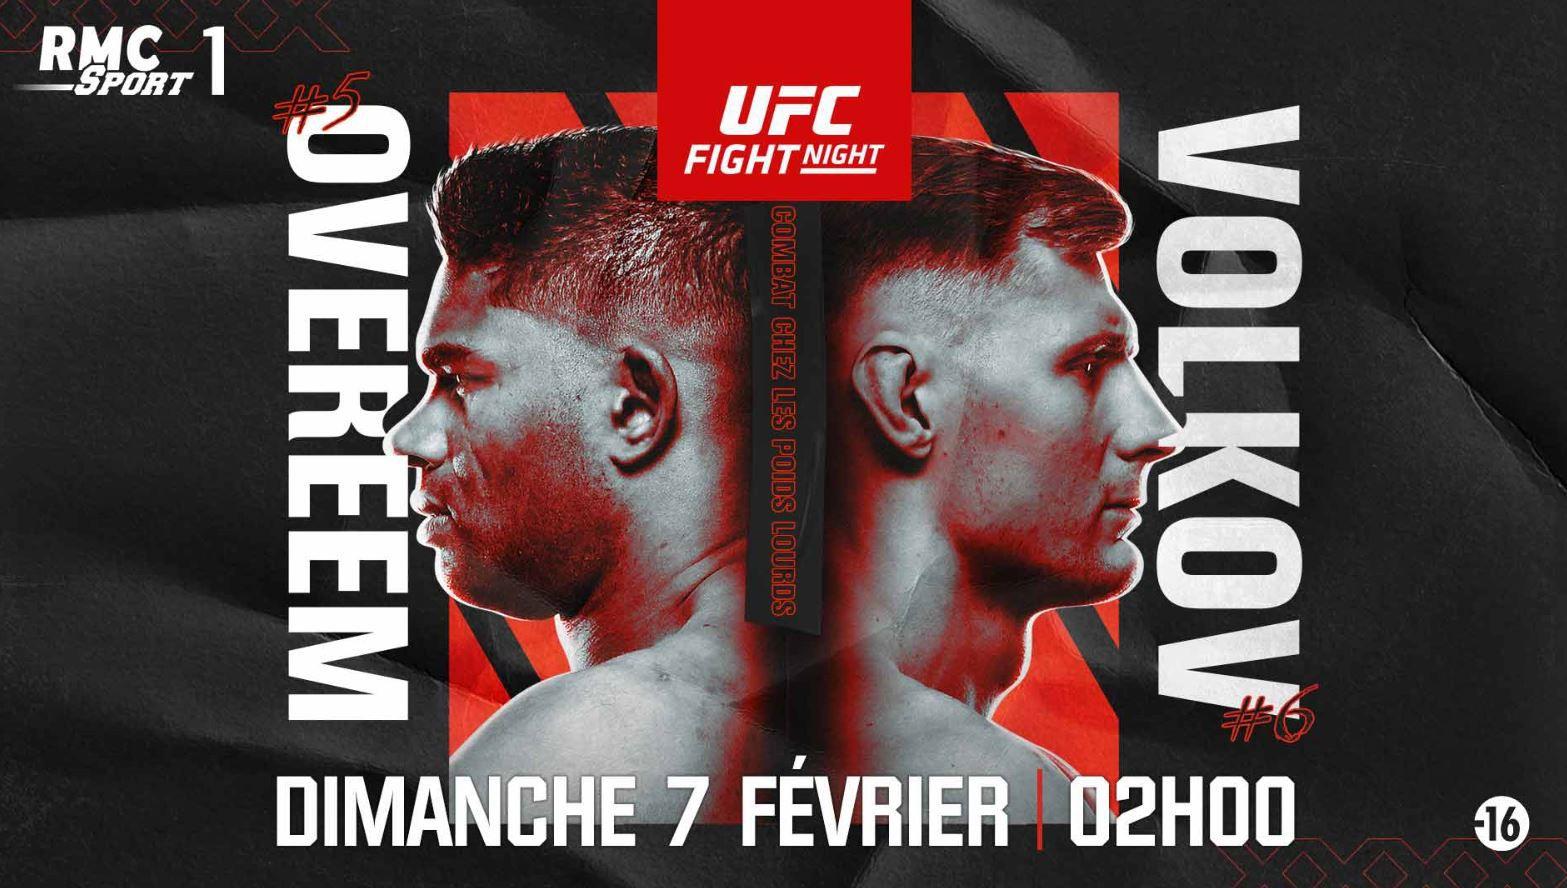 Alistair Overeem vs. Alexander Volkov (UFC Fight Night) dans la nuit de samedi à dimanche